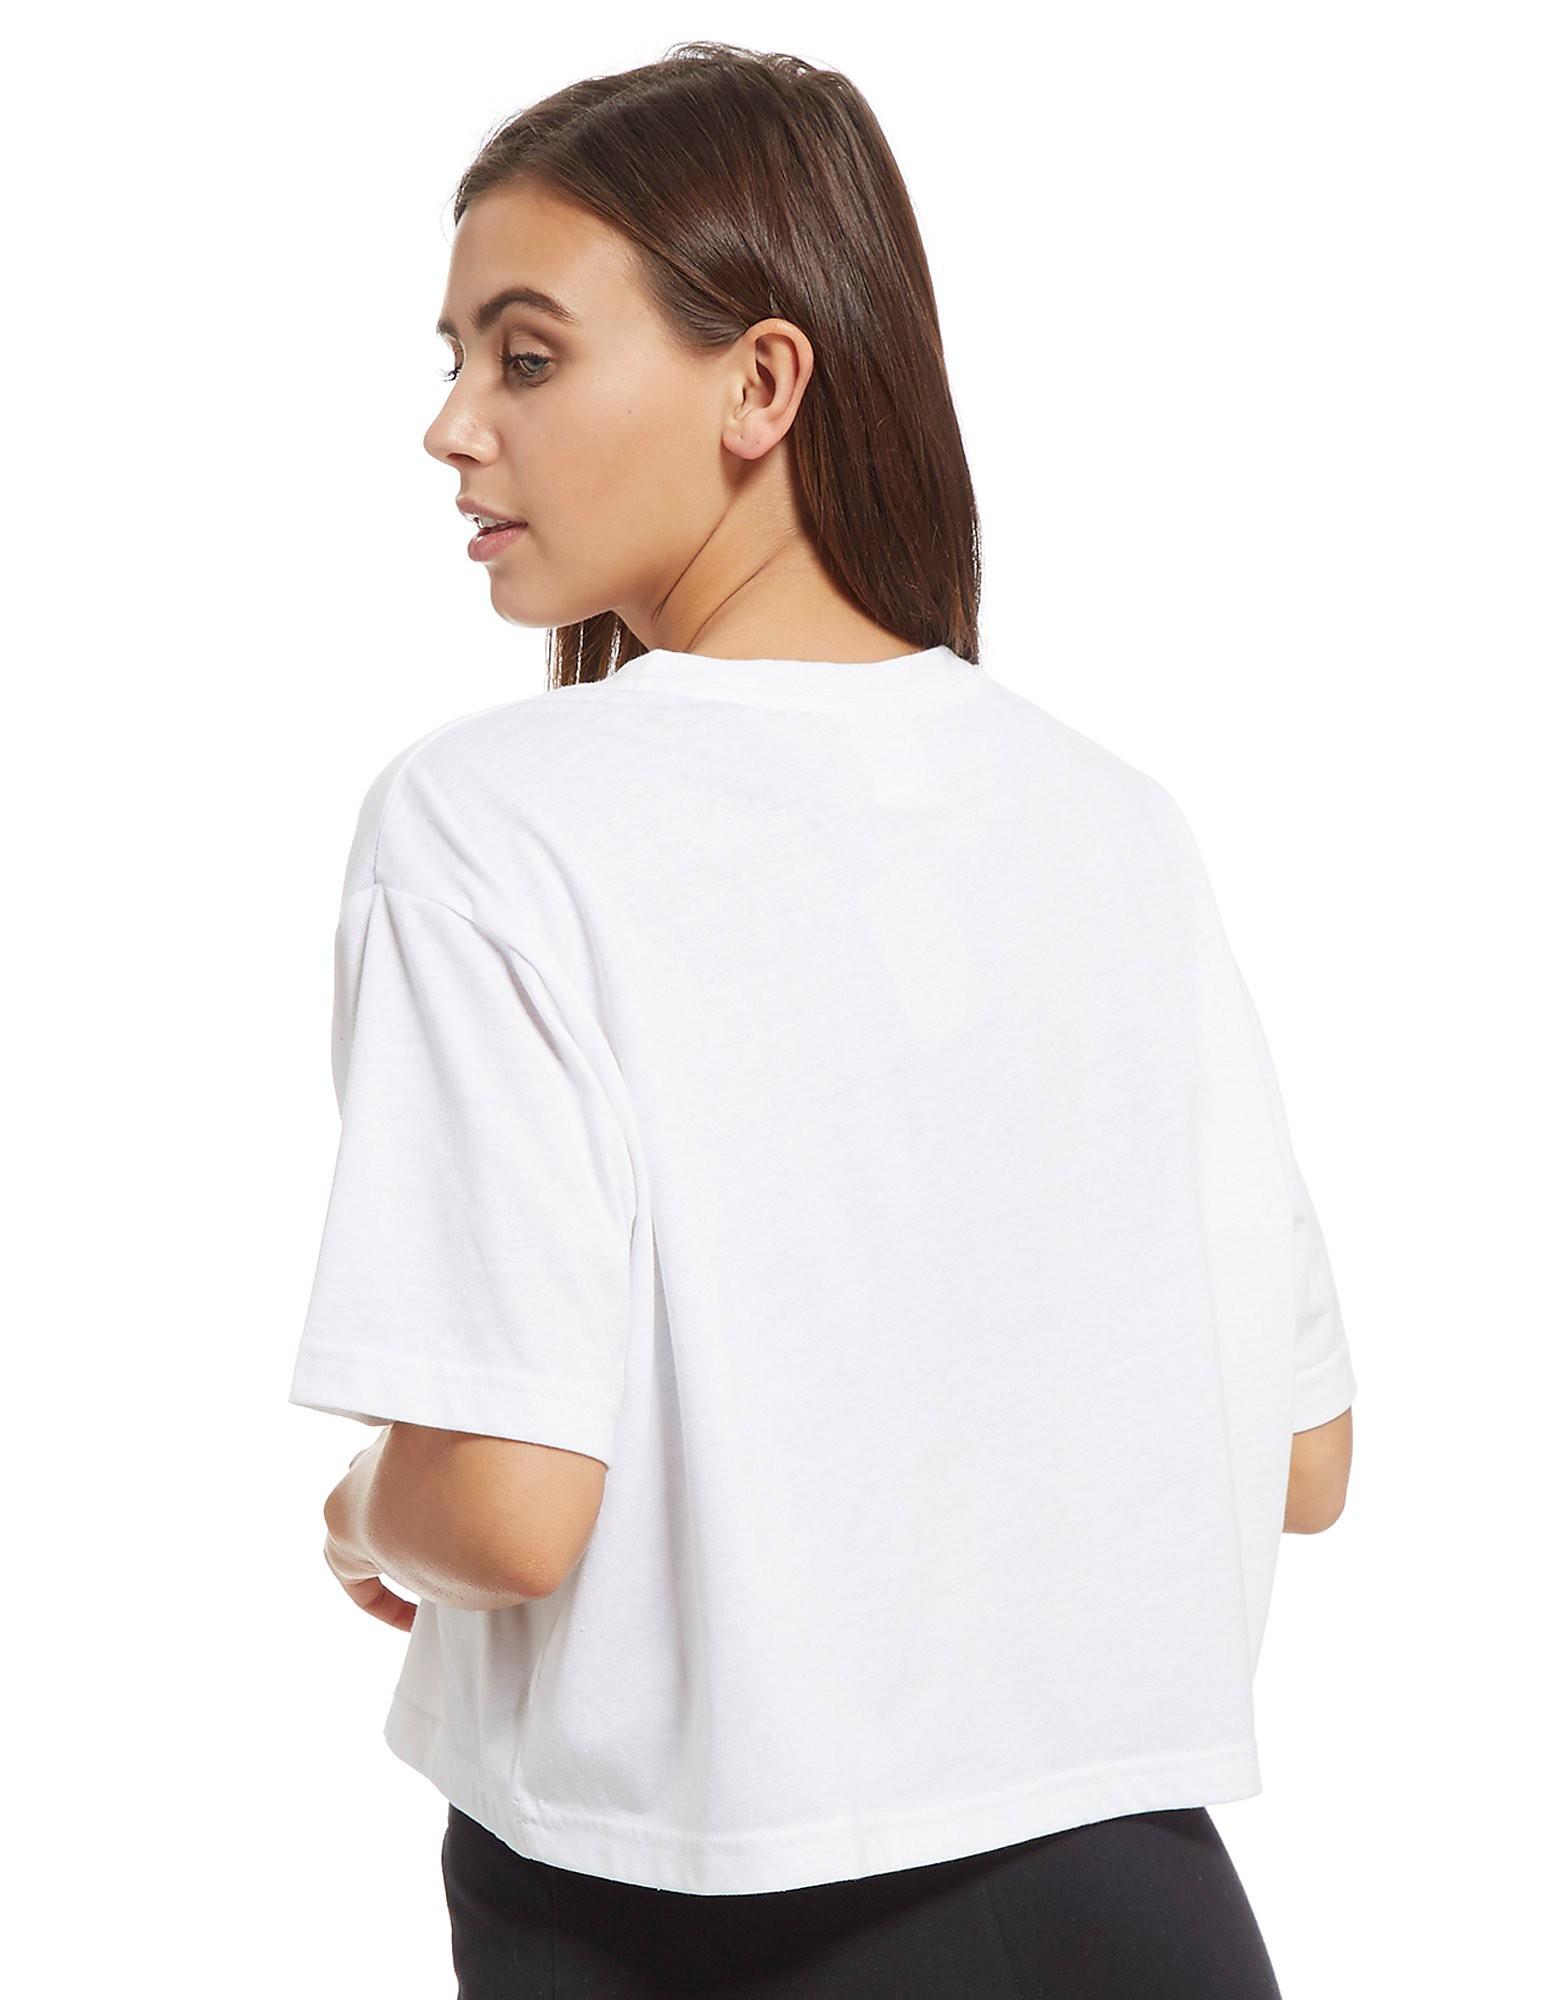 Reebok Classics Cropped T-Shirt